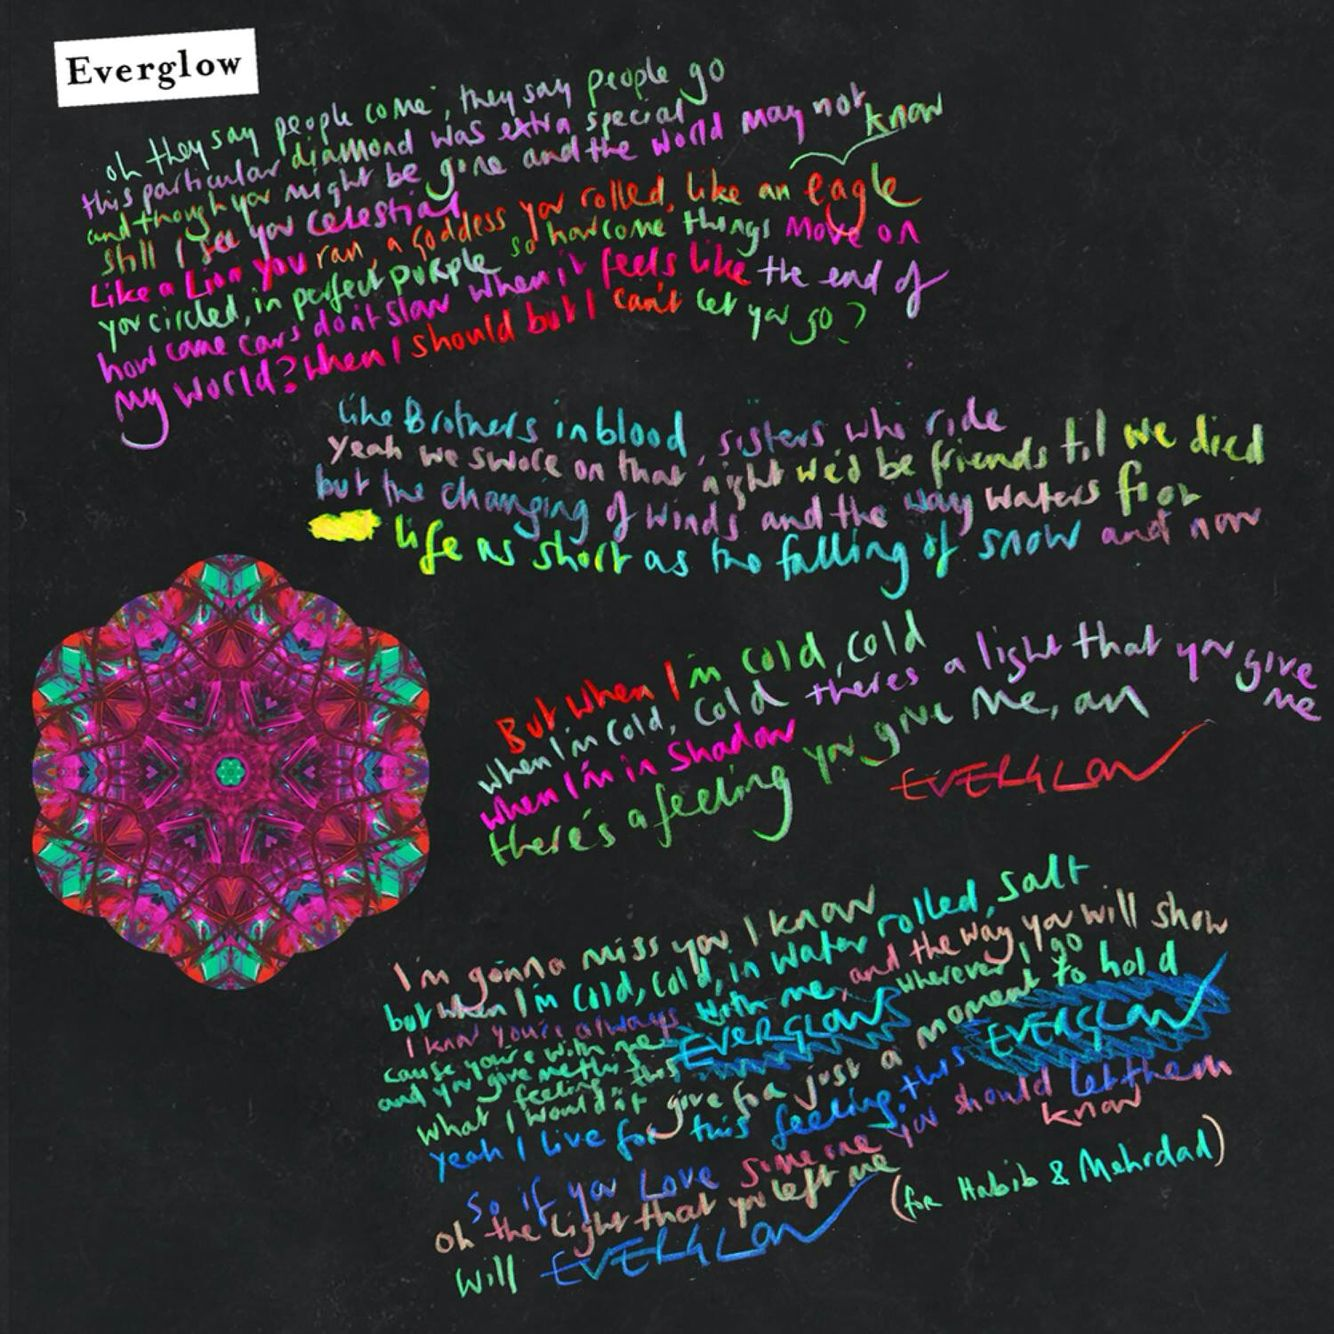 Everglow Lyrics For B At Christmas Coldplay Coldplay Lyrics Everglow Lyrics